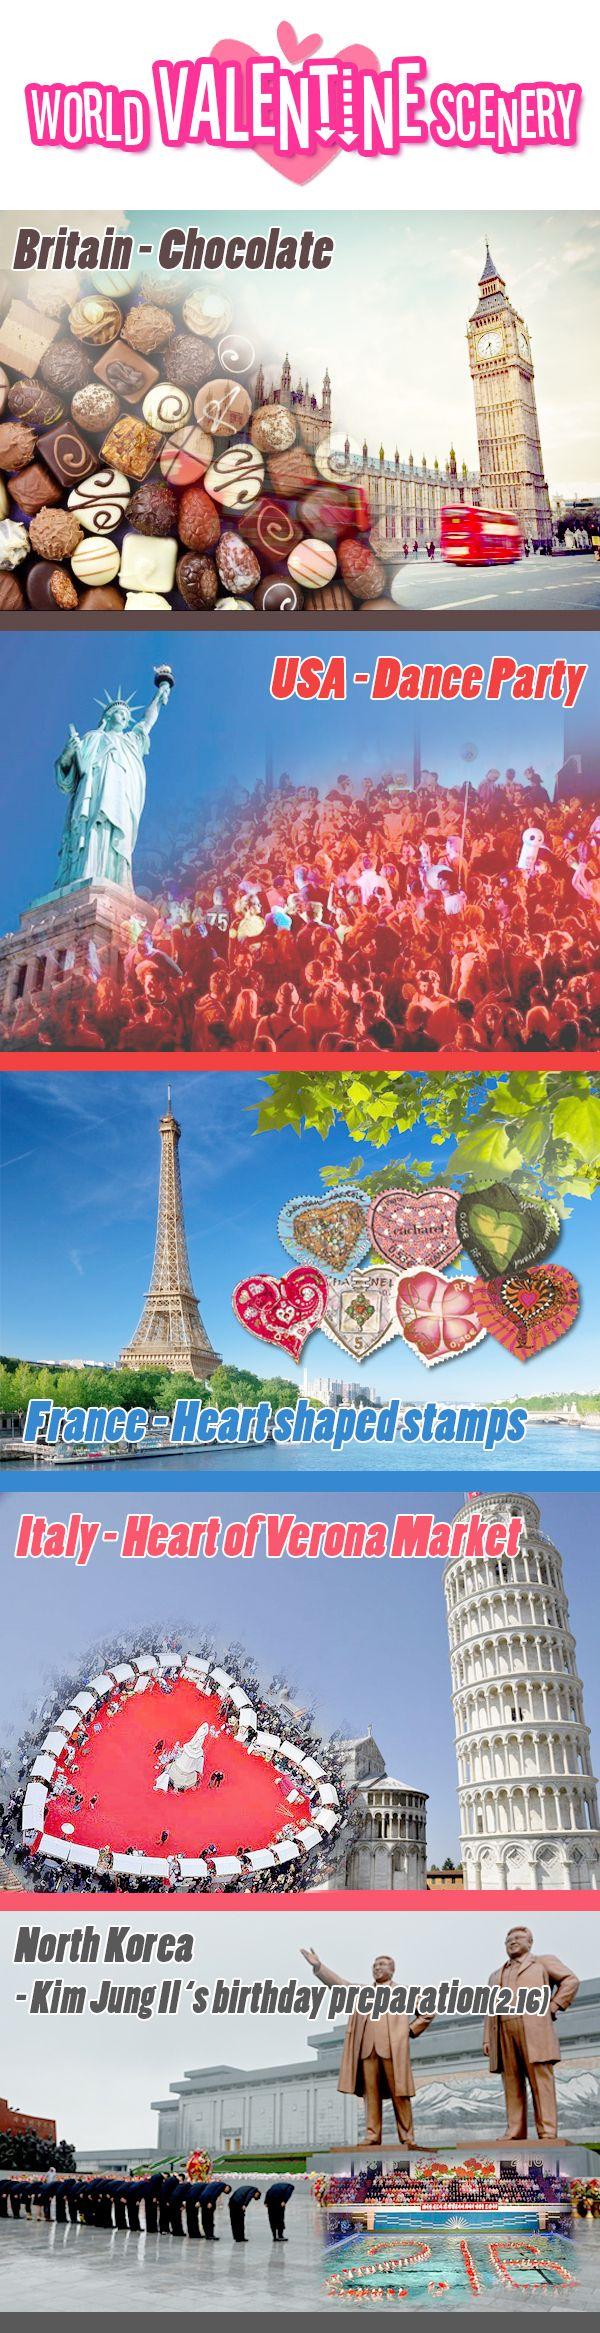 world valentine scenery